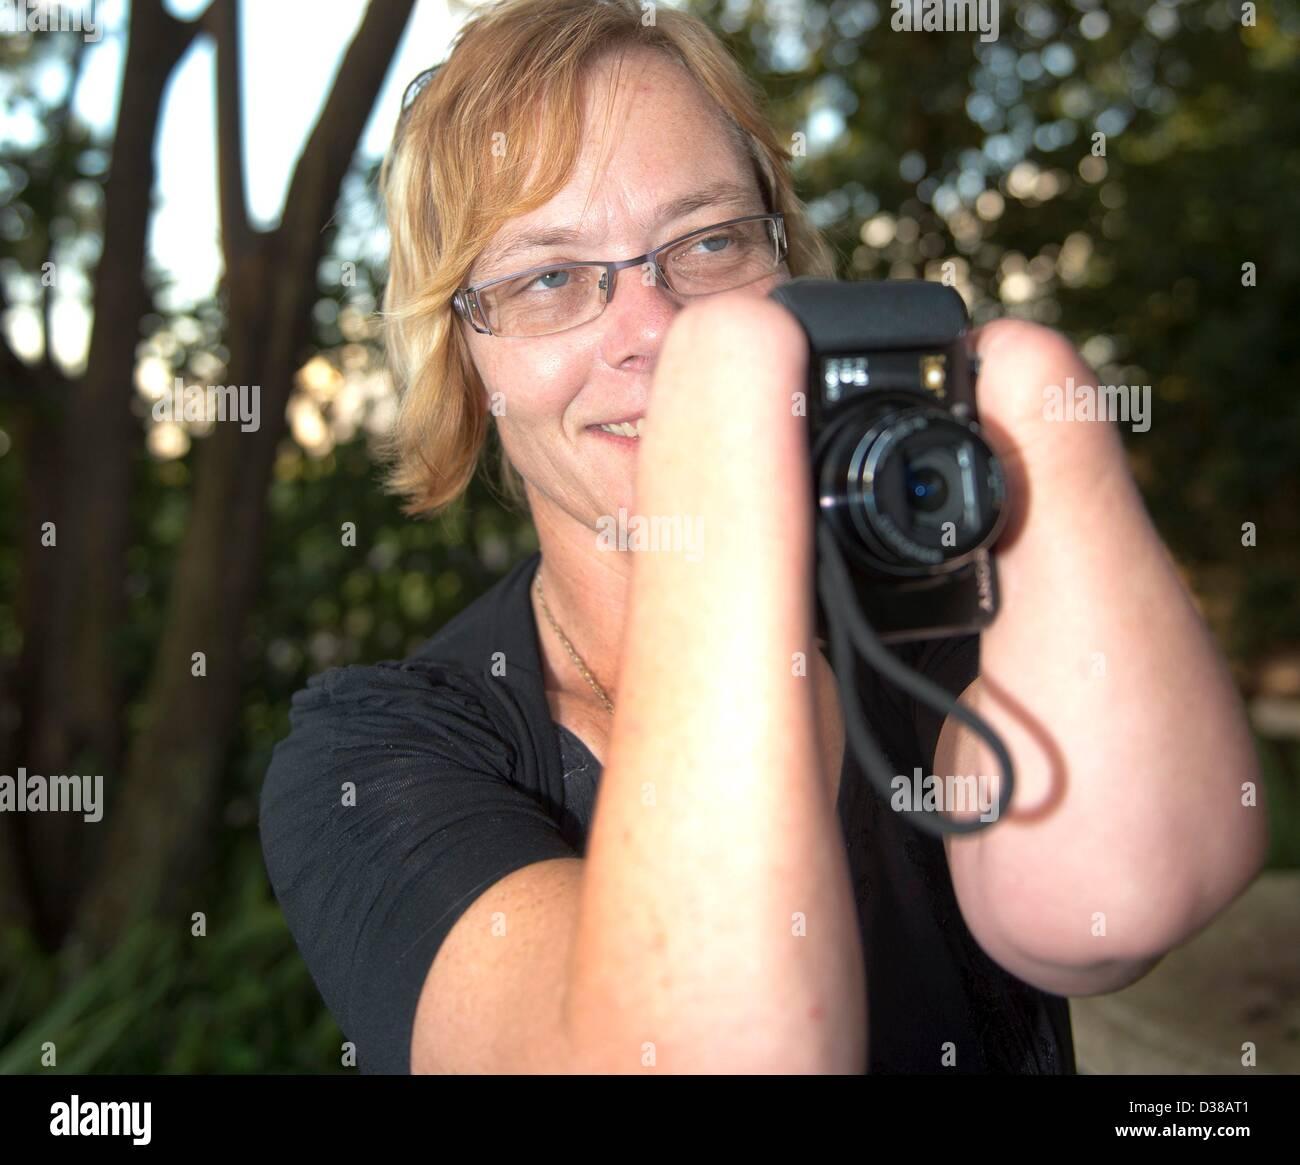 VEREENIGING, SOUTH AFRICA: Elize Henwood on February 2, 2013, in Vereniging, South Africa. Elize lost both her hands - Stock Image